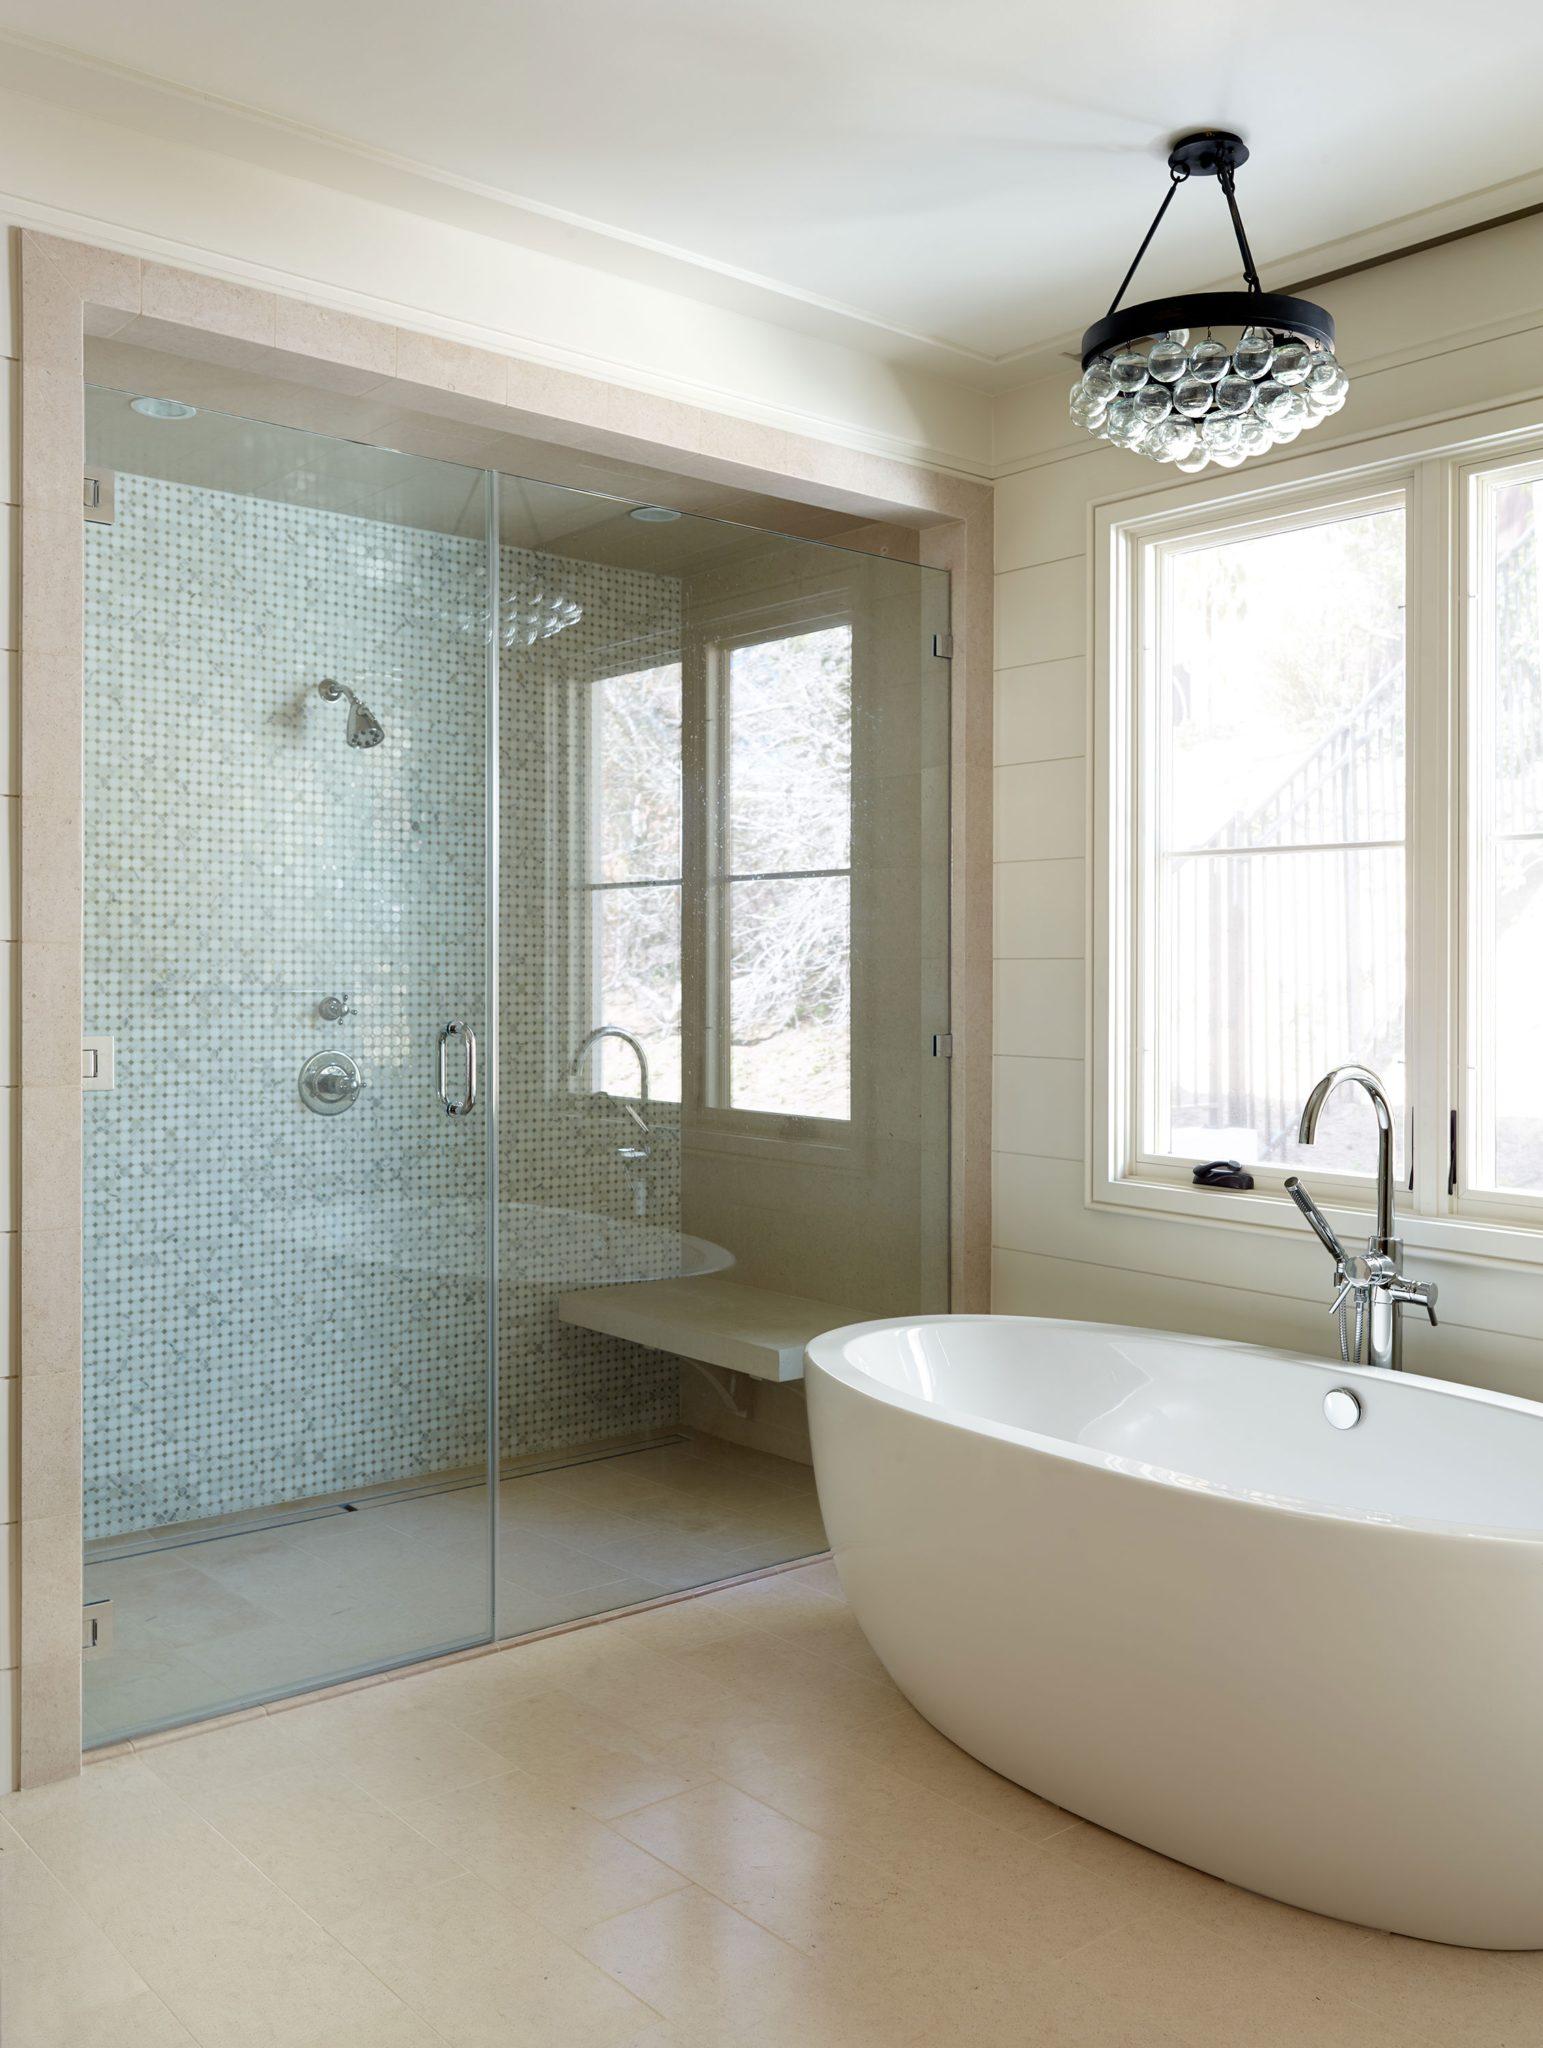 Interior design byNorman Design Group